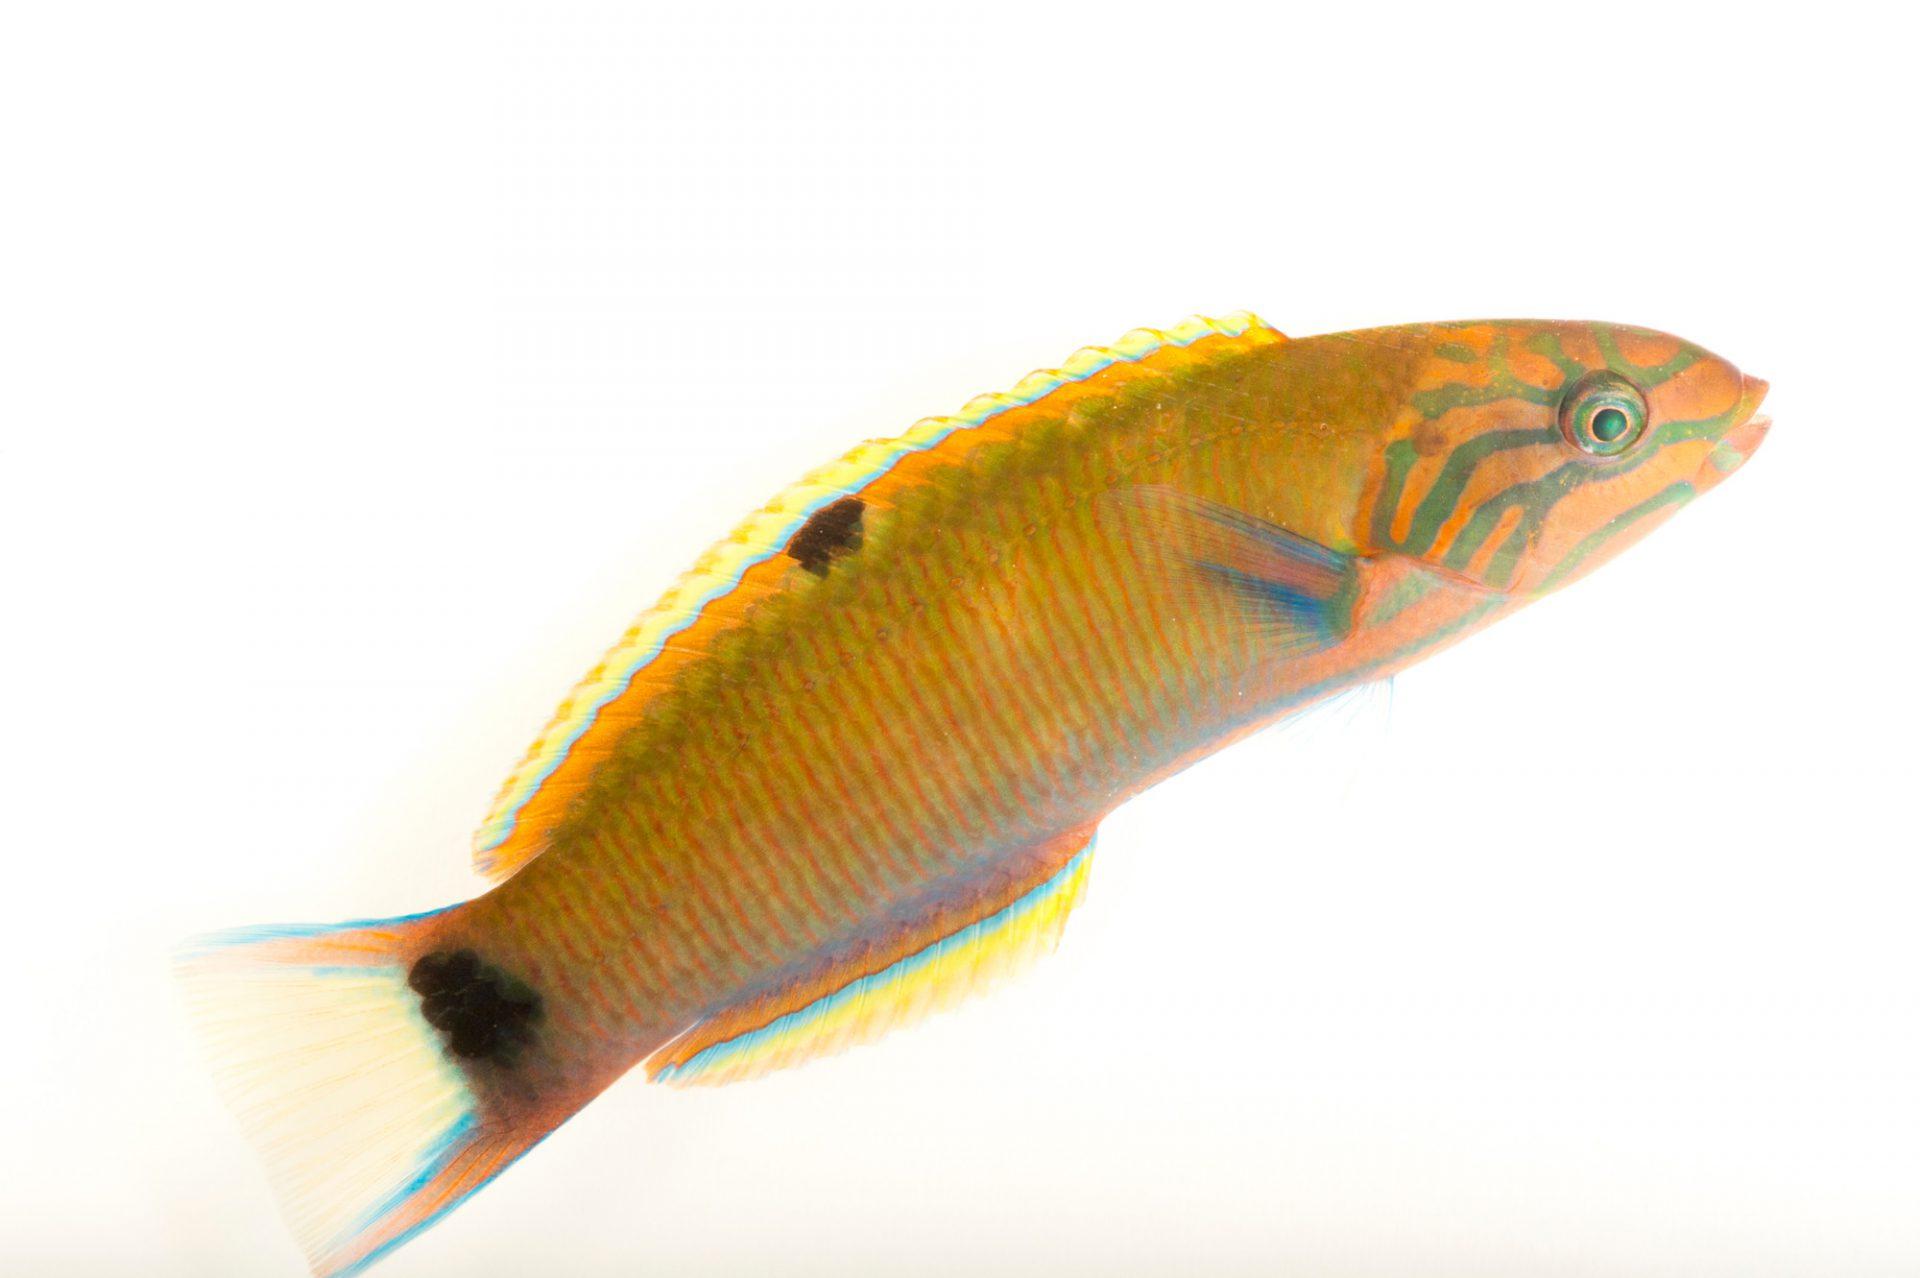 Photo: Lyretail Wrasse (Thalassoma lunare) from Pure Aquariums.